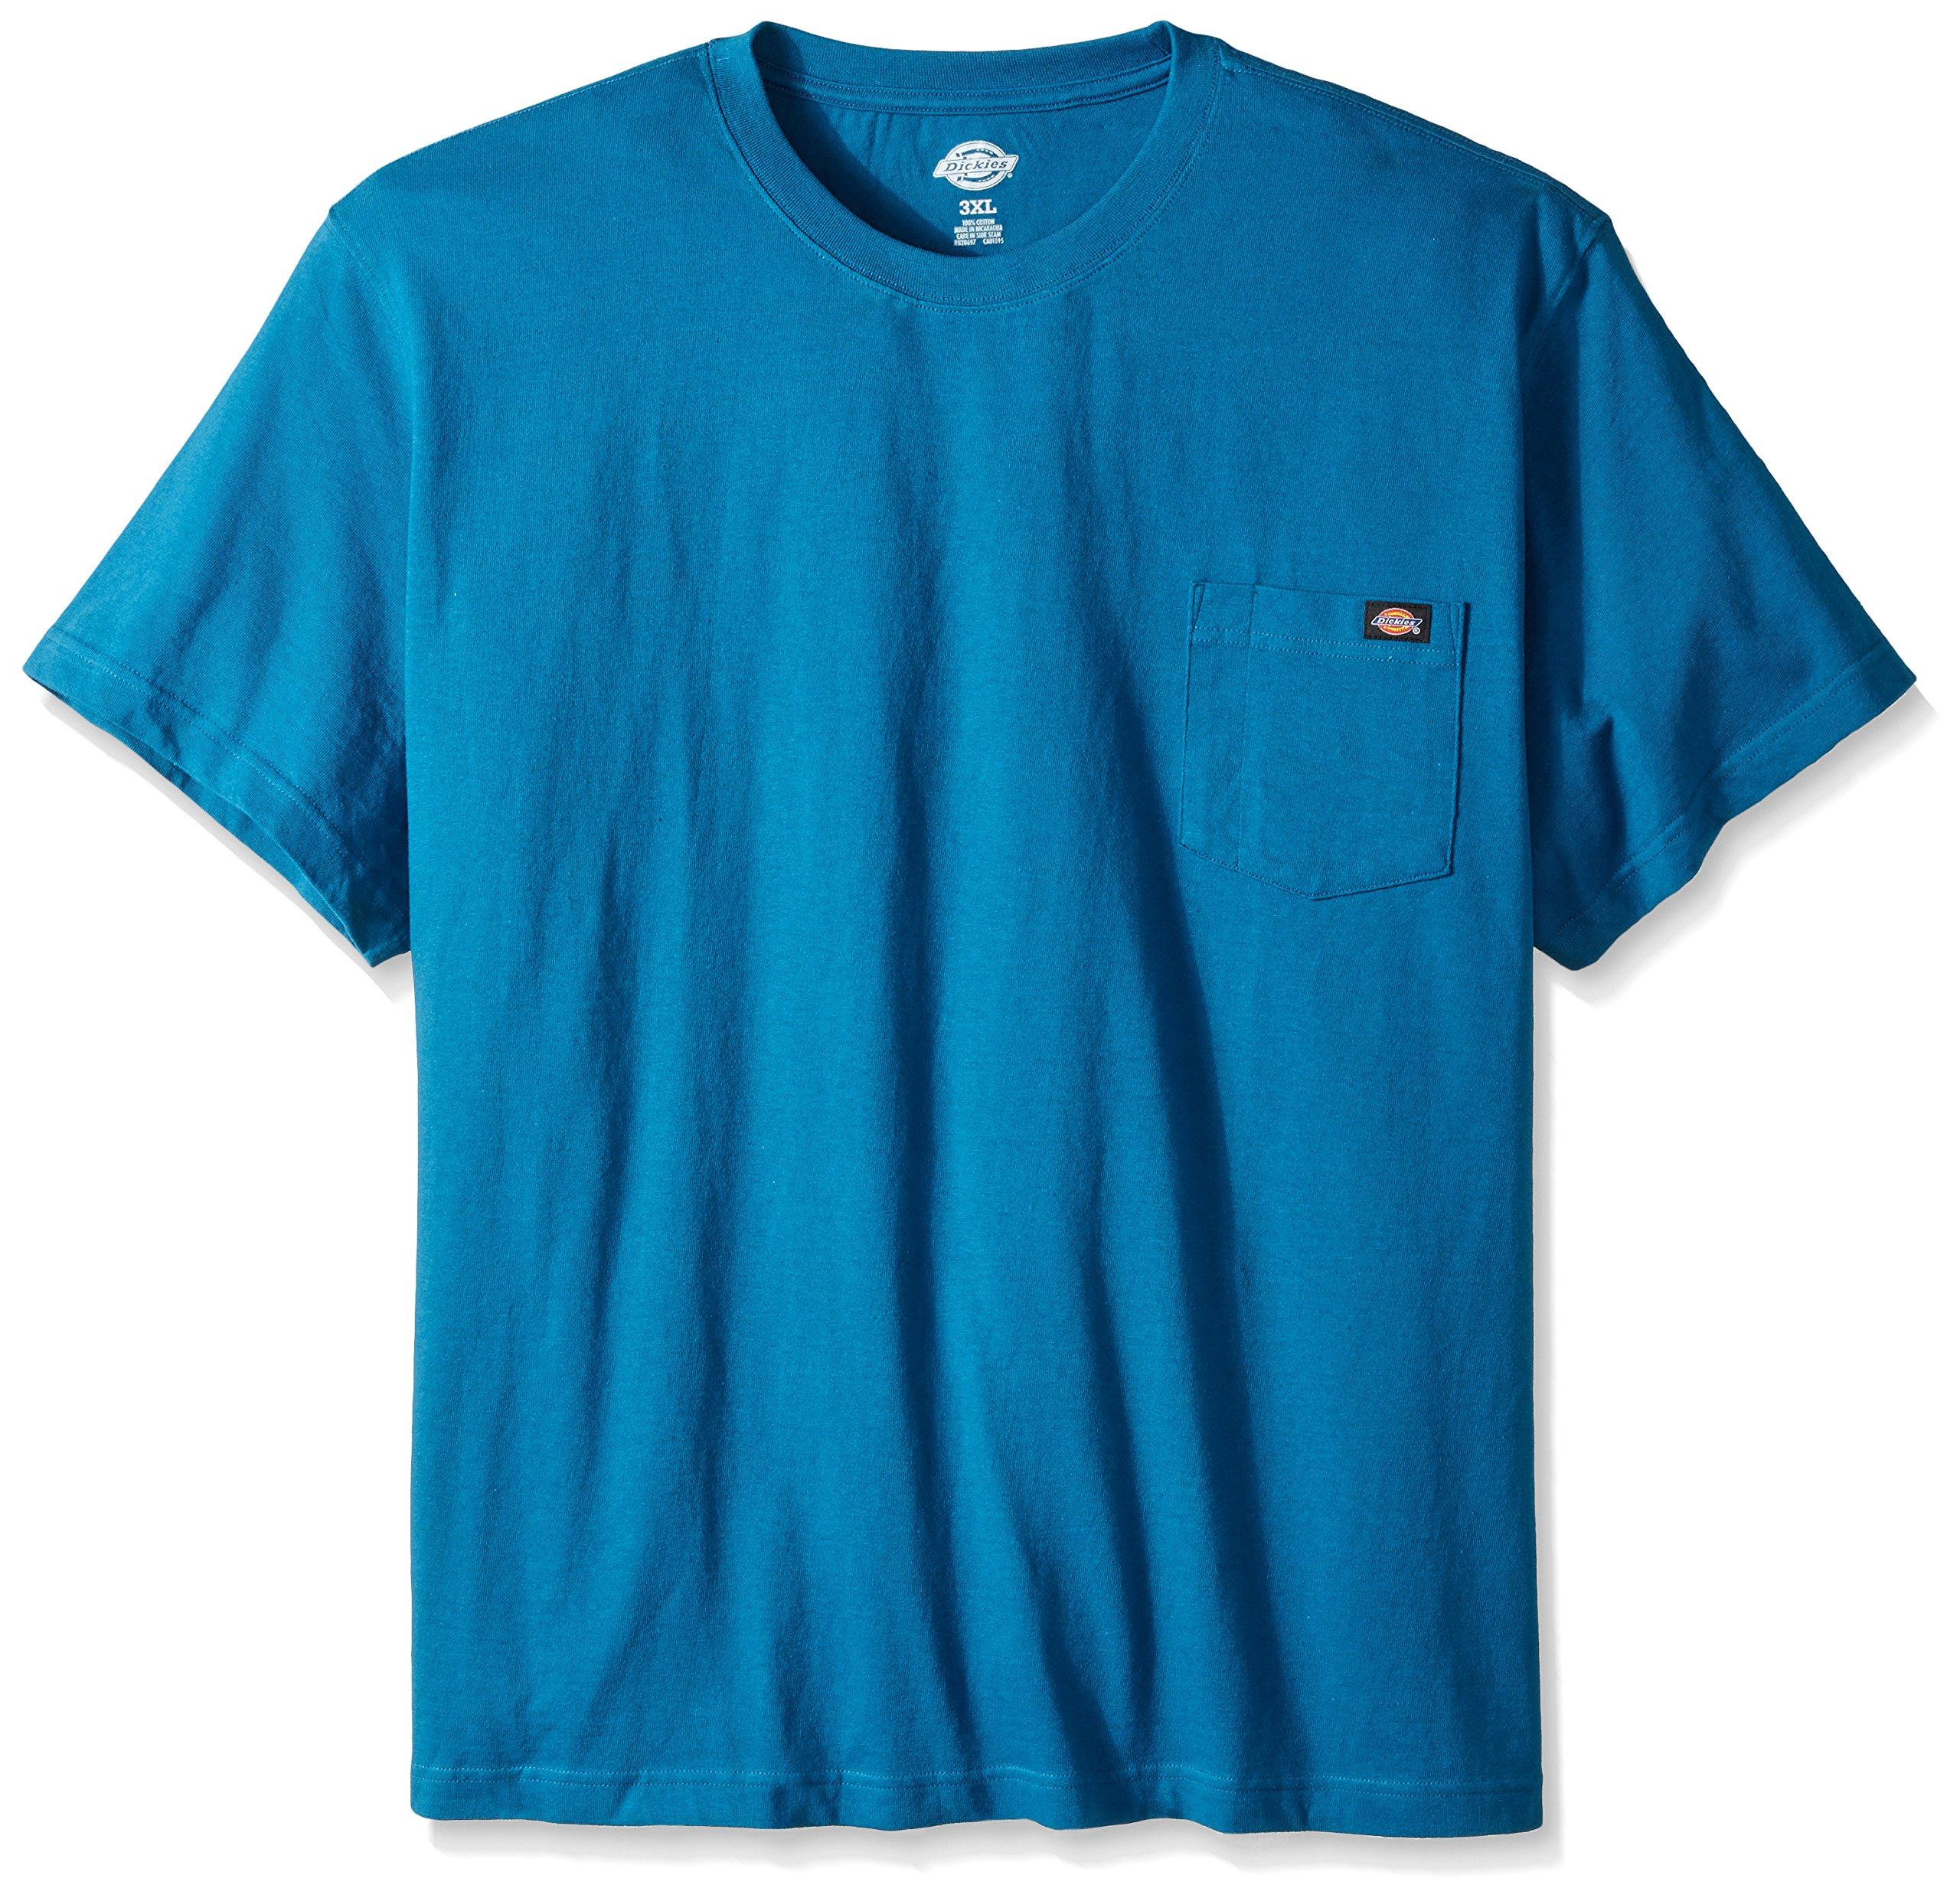 Dickies Men's Big and Tall Short Sleeve Heavyweight Crew Neck Pocket T-Shirt, Southern Fall, X-Large Tall